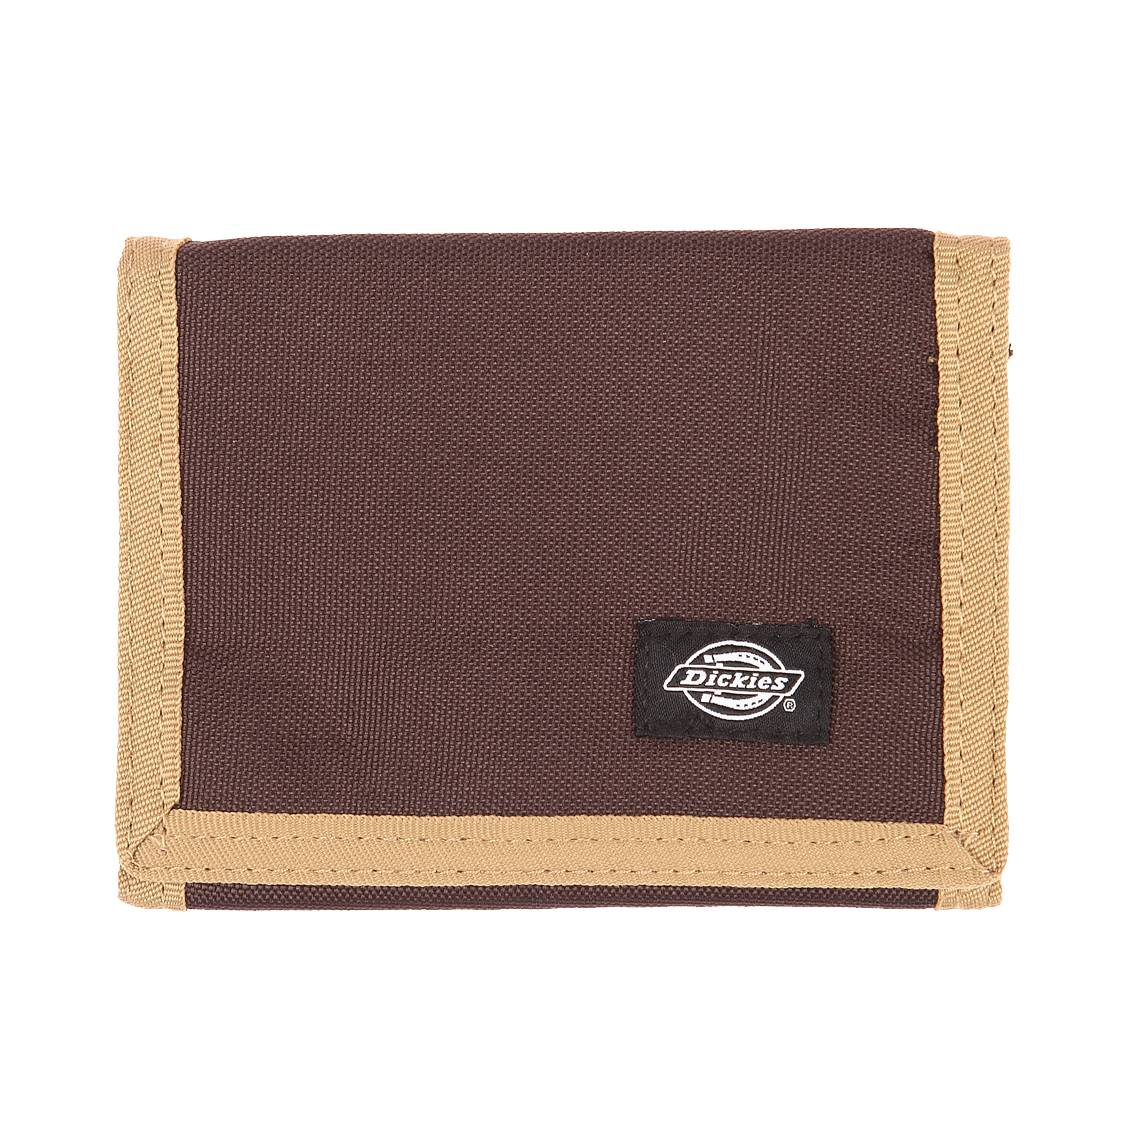 Portefeuille  en tissu chocolat et beige